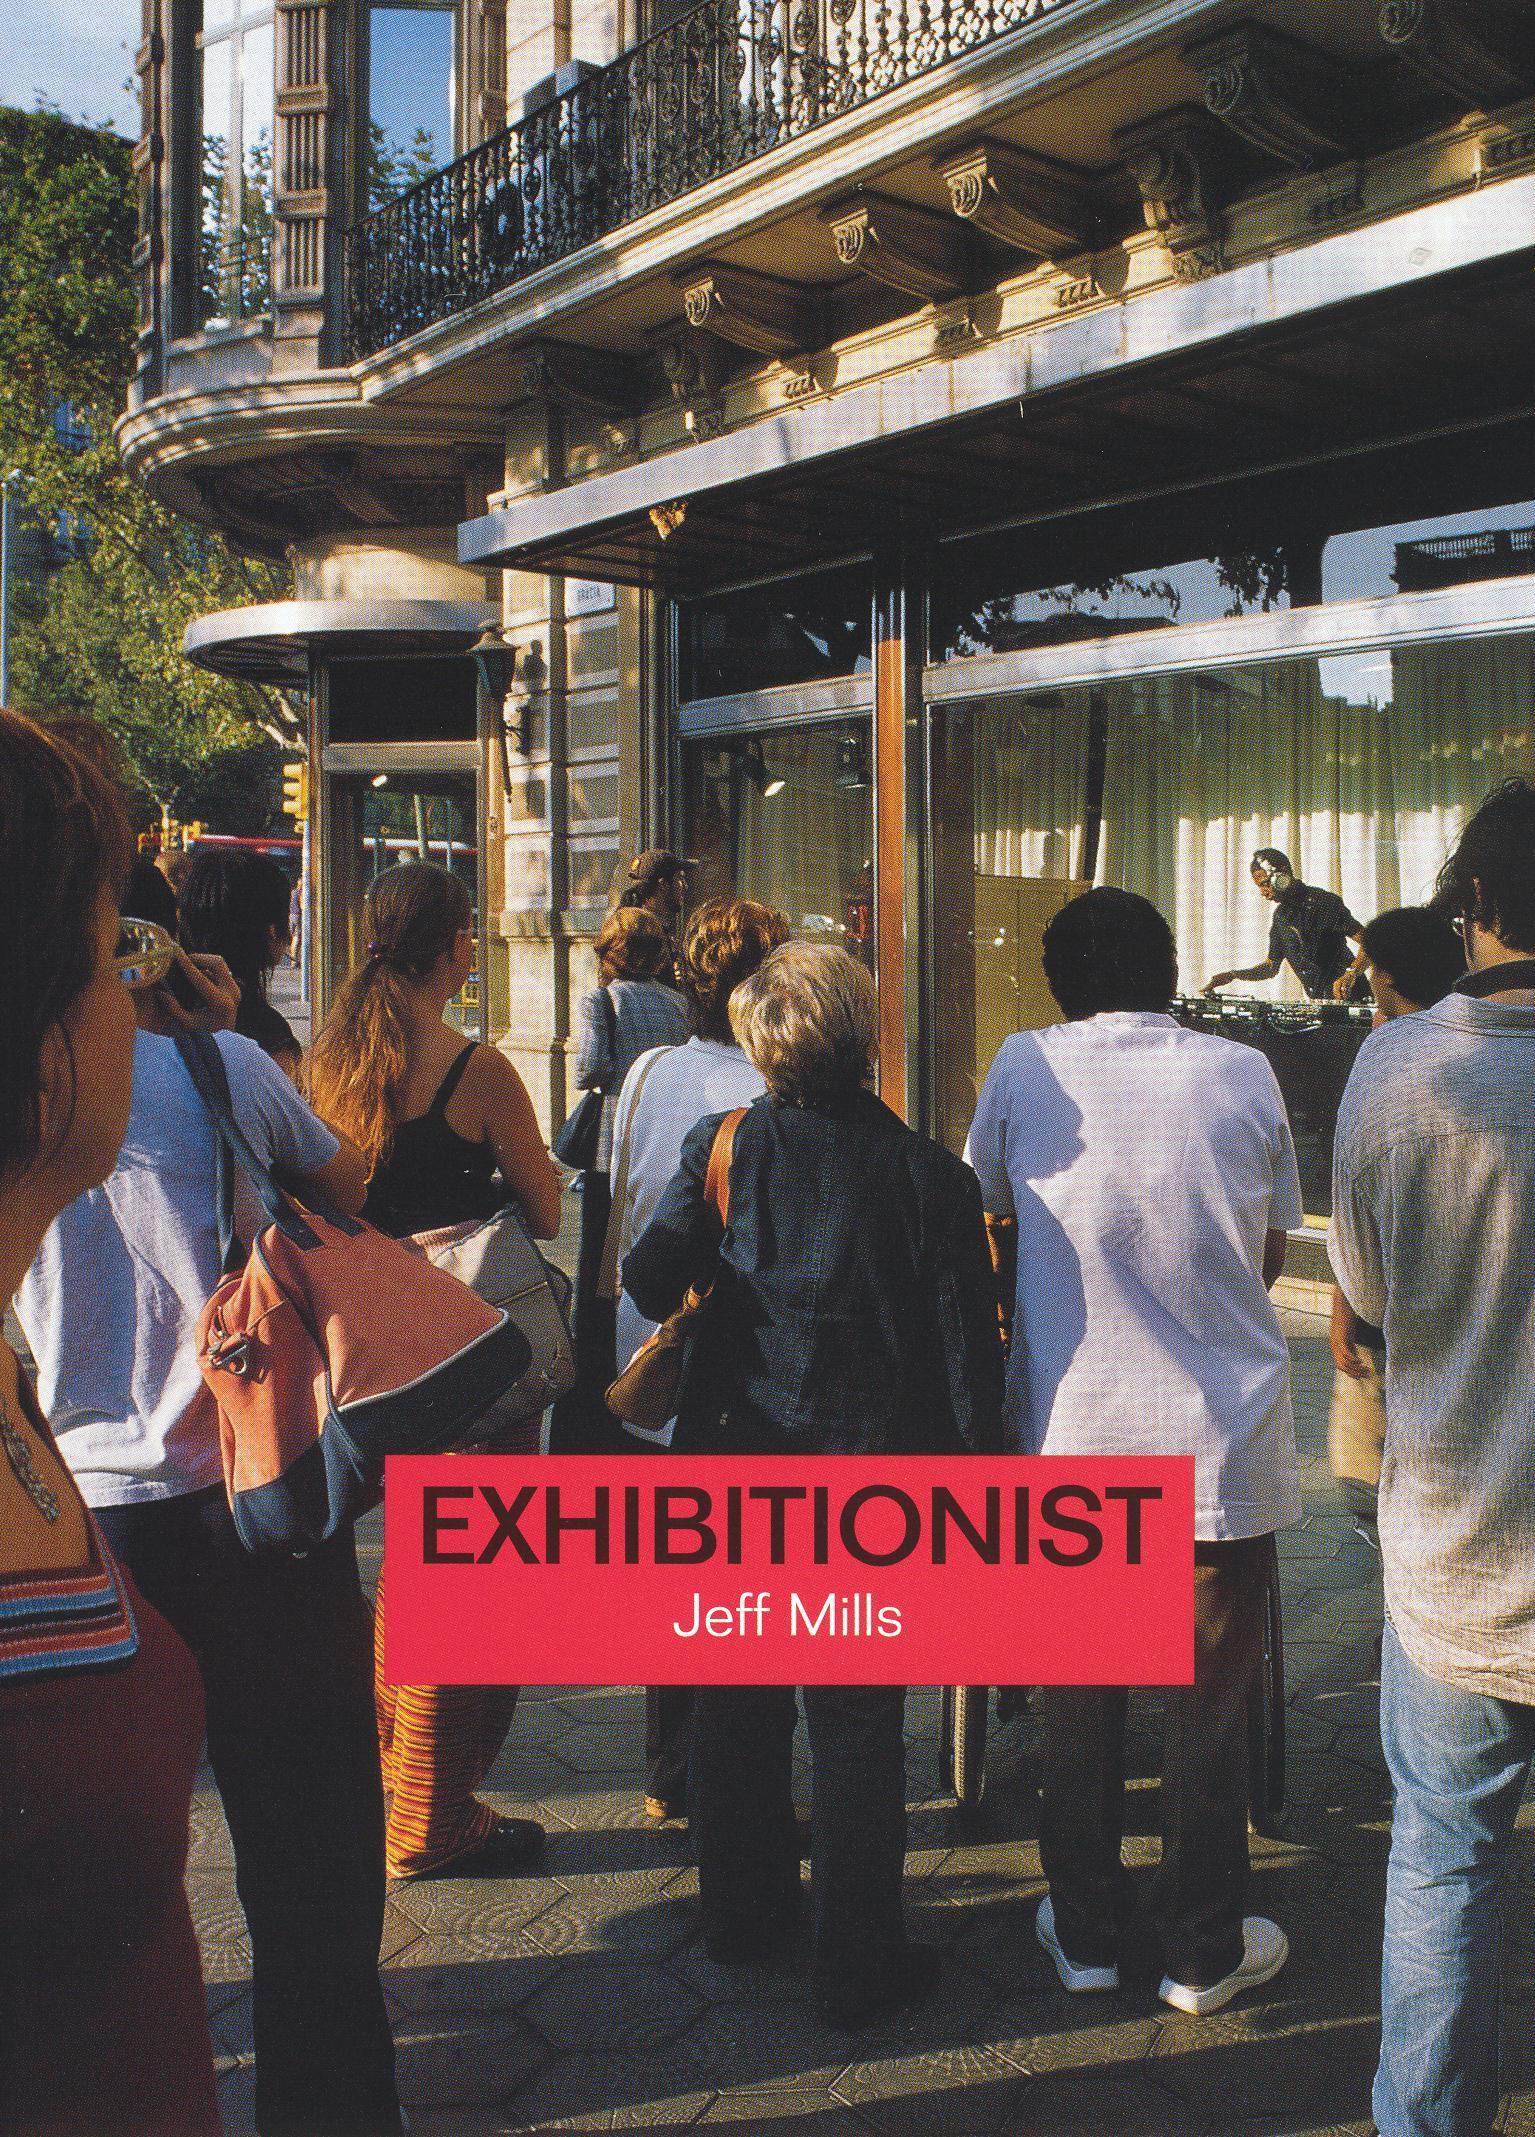 Jeff Mills: Exhibitionist